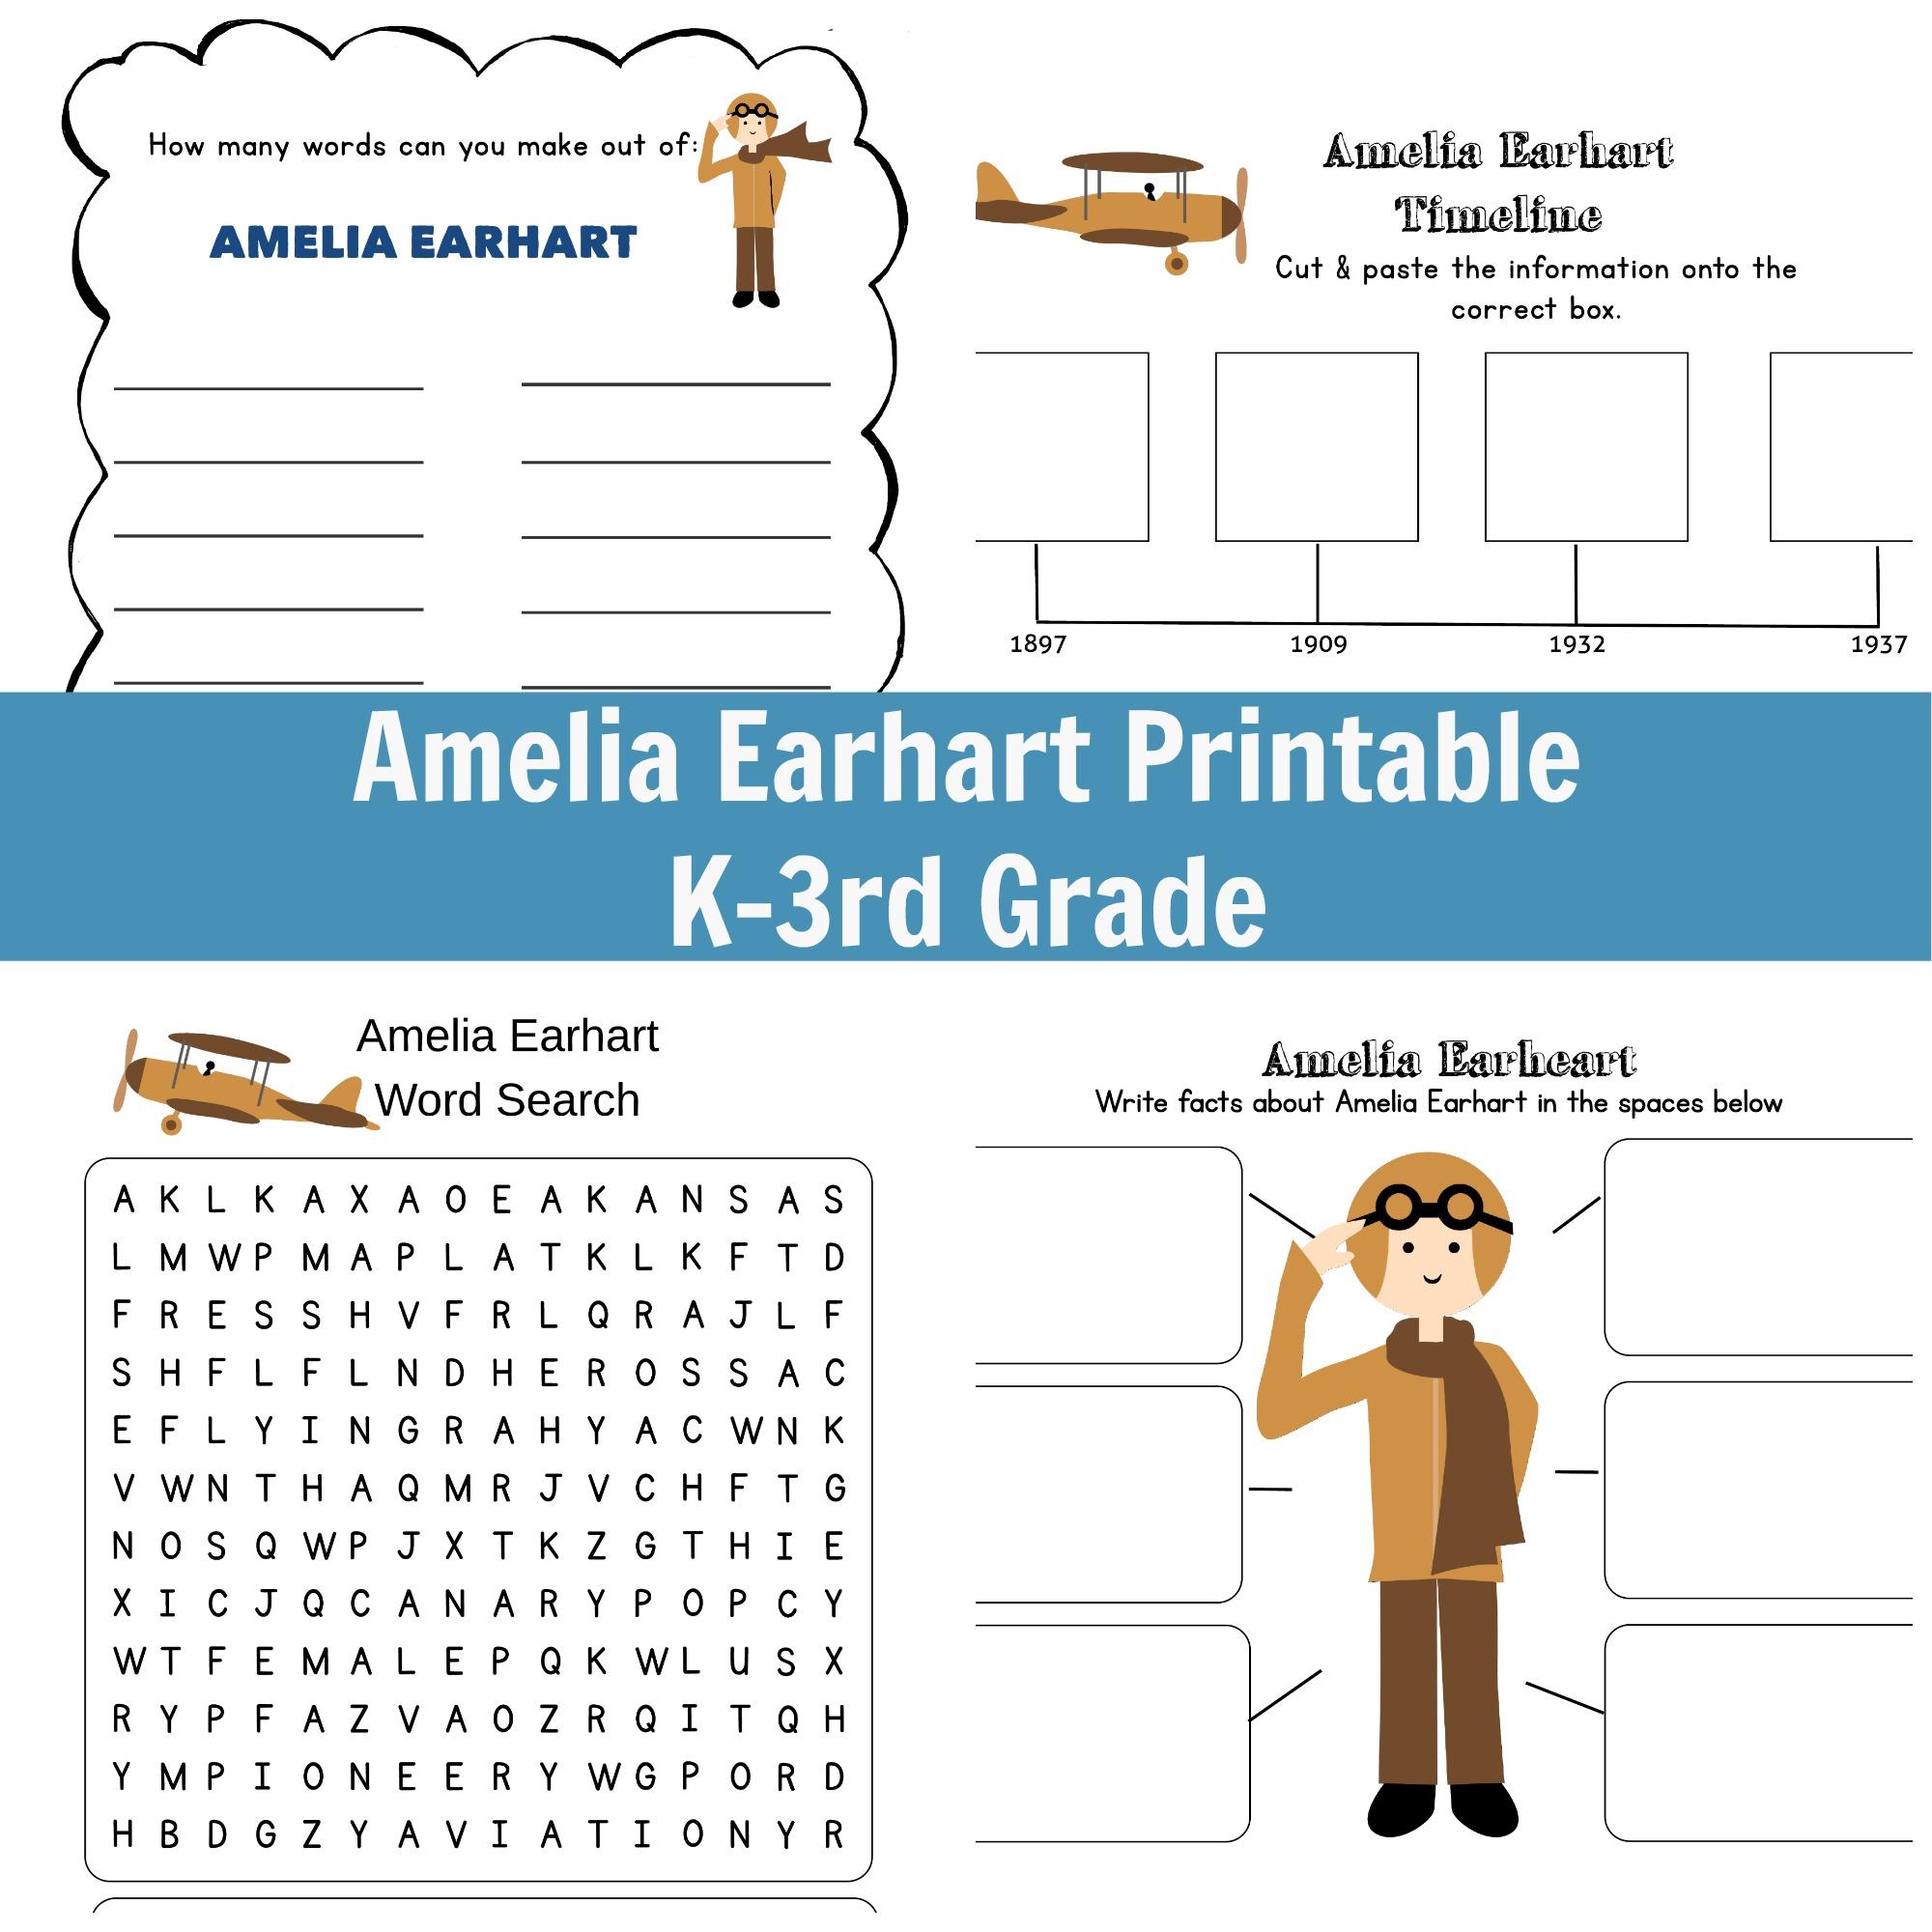 hight resolution of Amelia Earhart Printable - Grades K-3